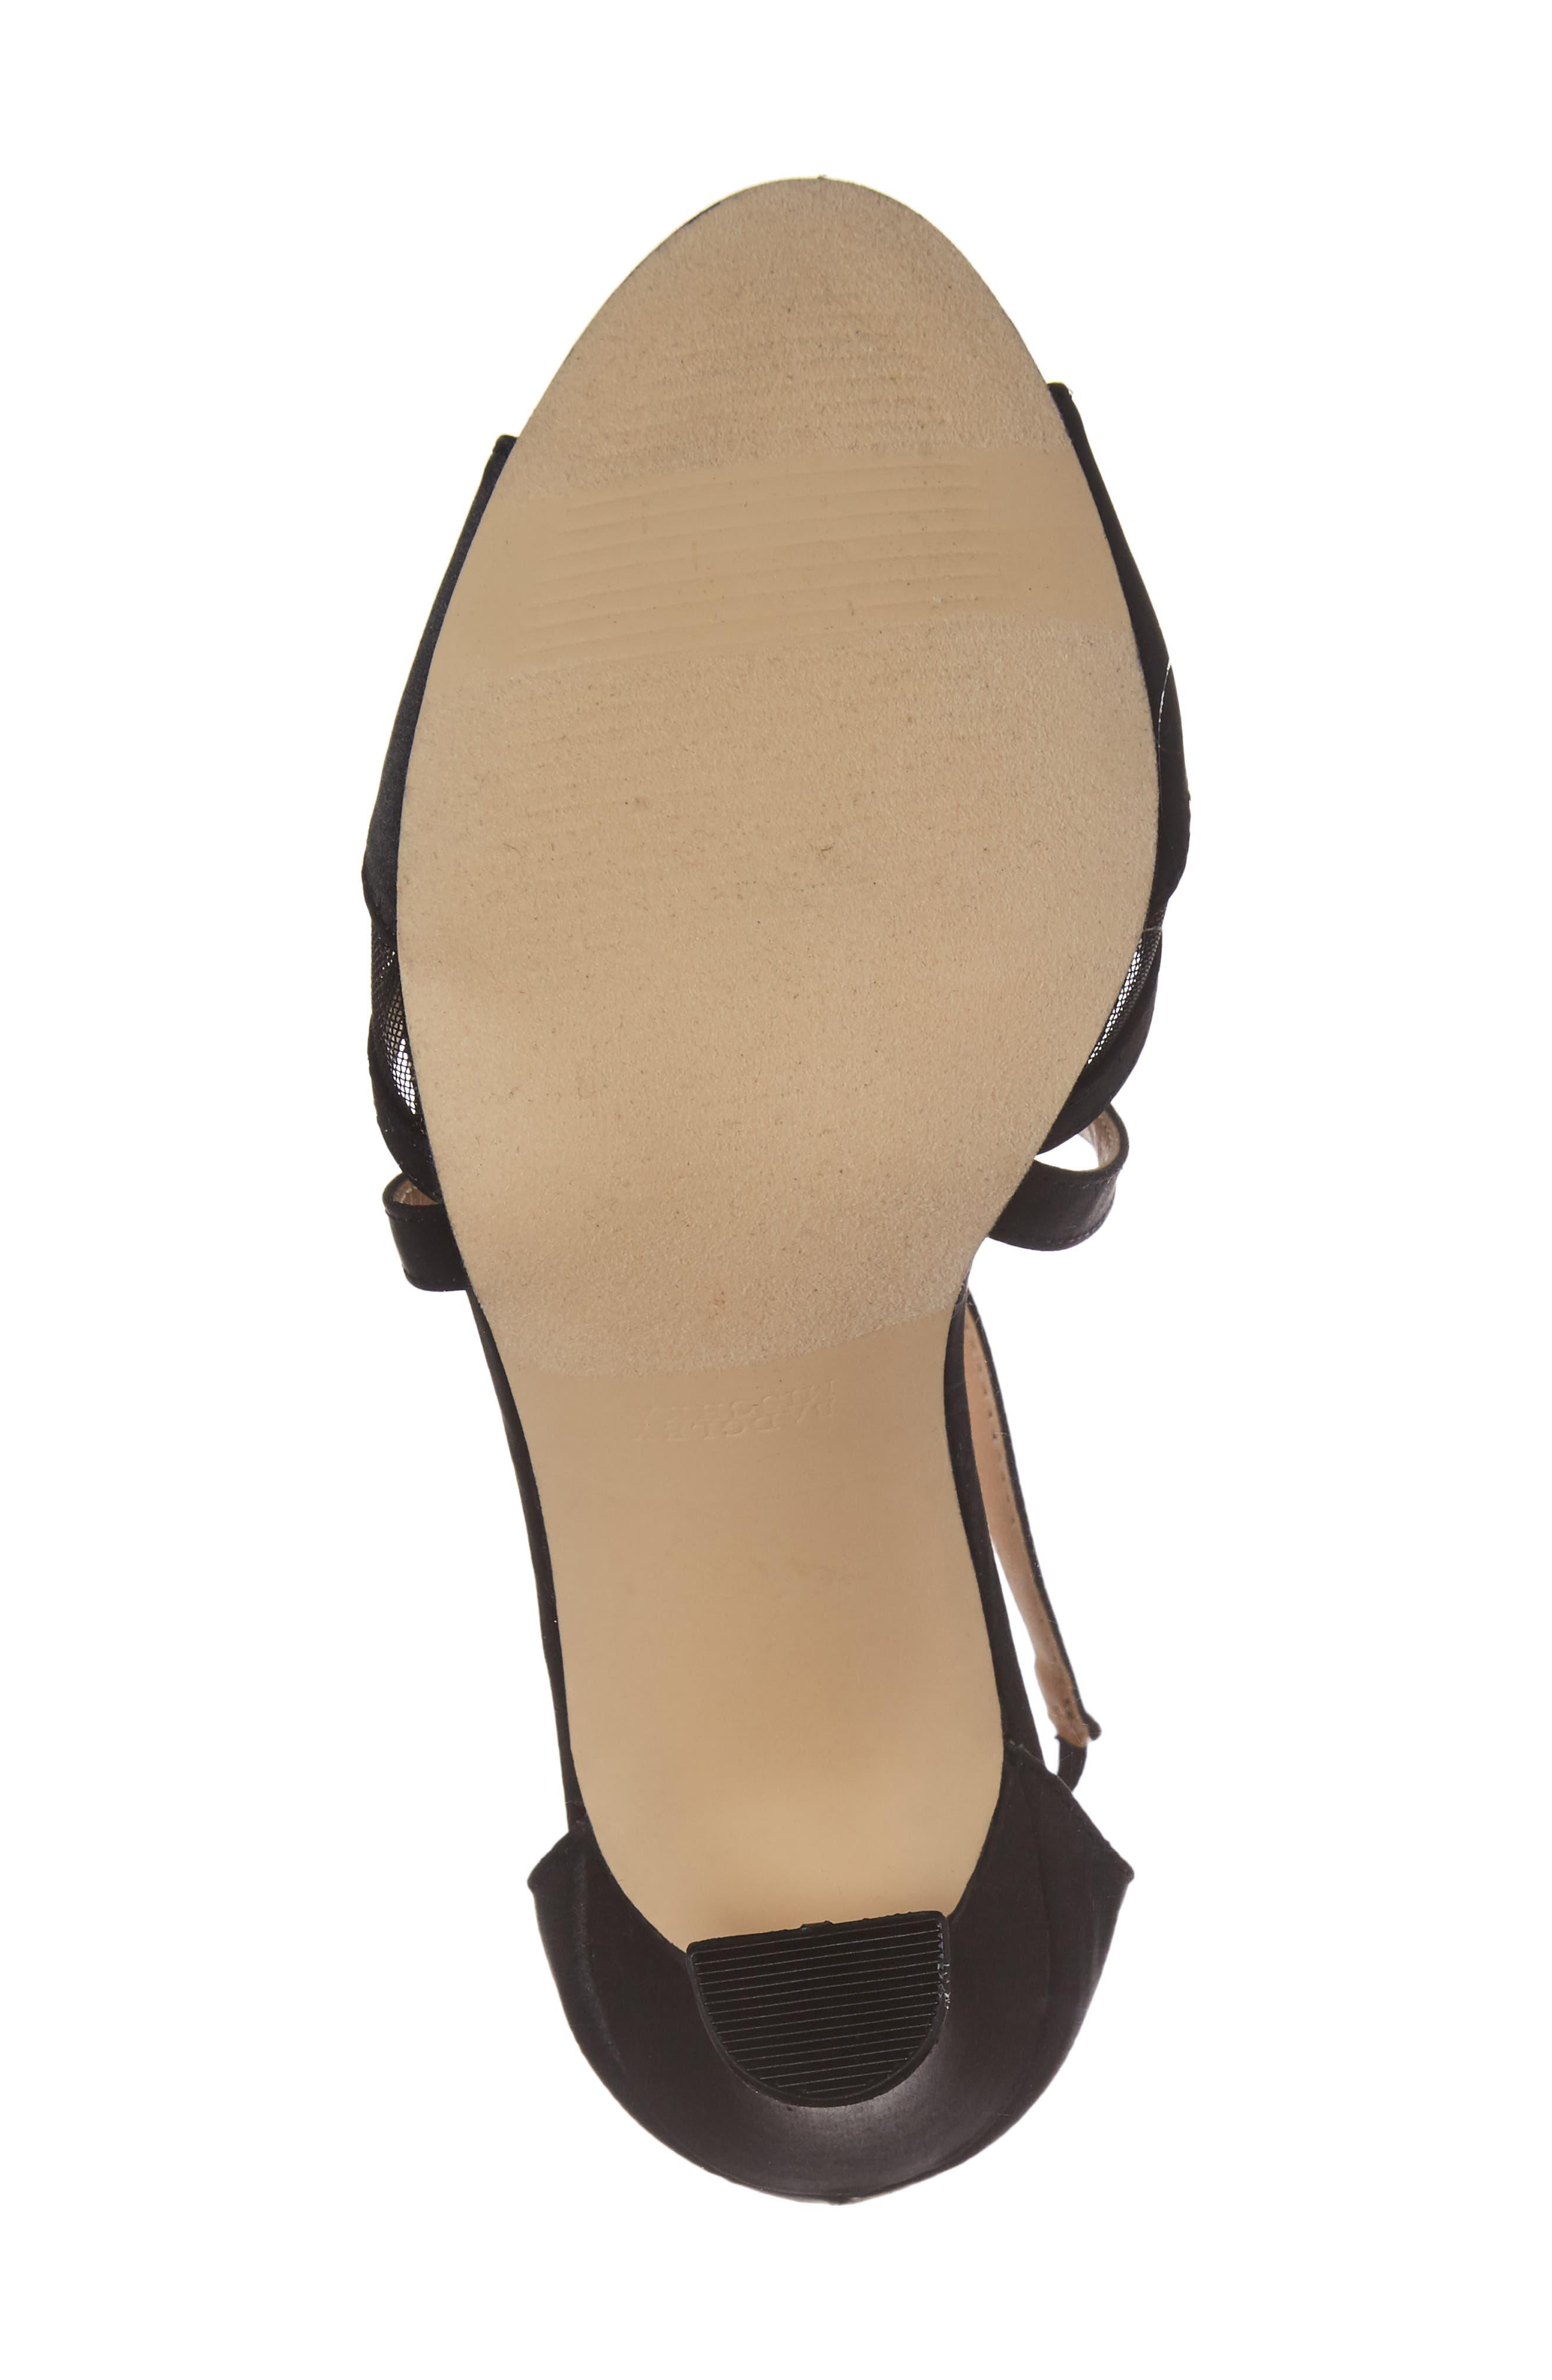 Kandall Hannah Embellished Cross Strap Sandal,                             Alternate thumbnail 6, color,                             Black Satin